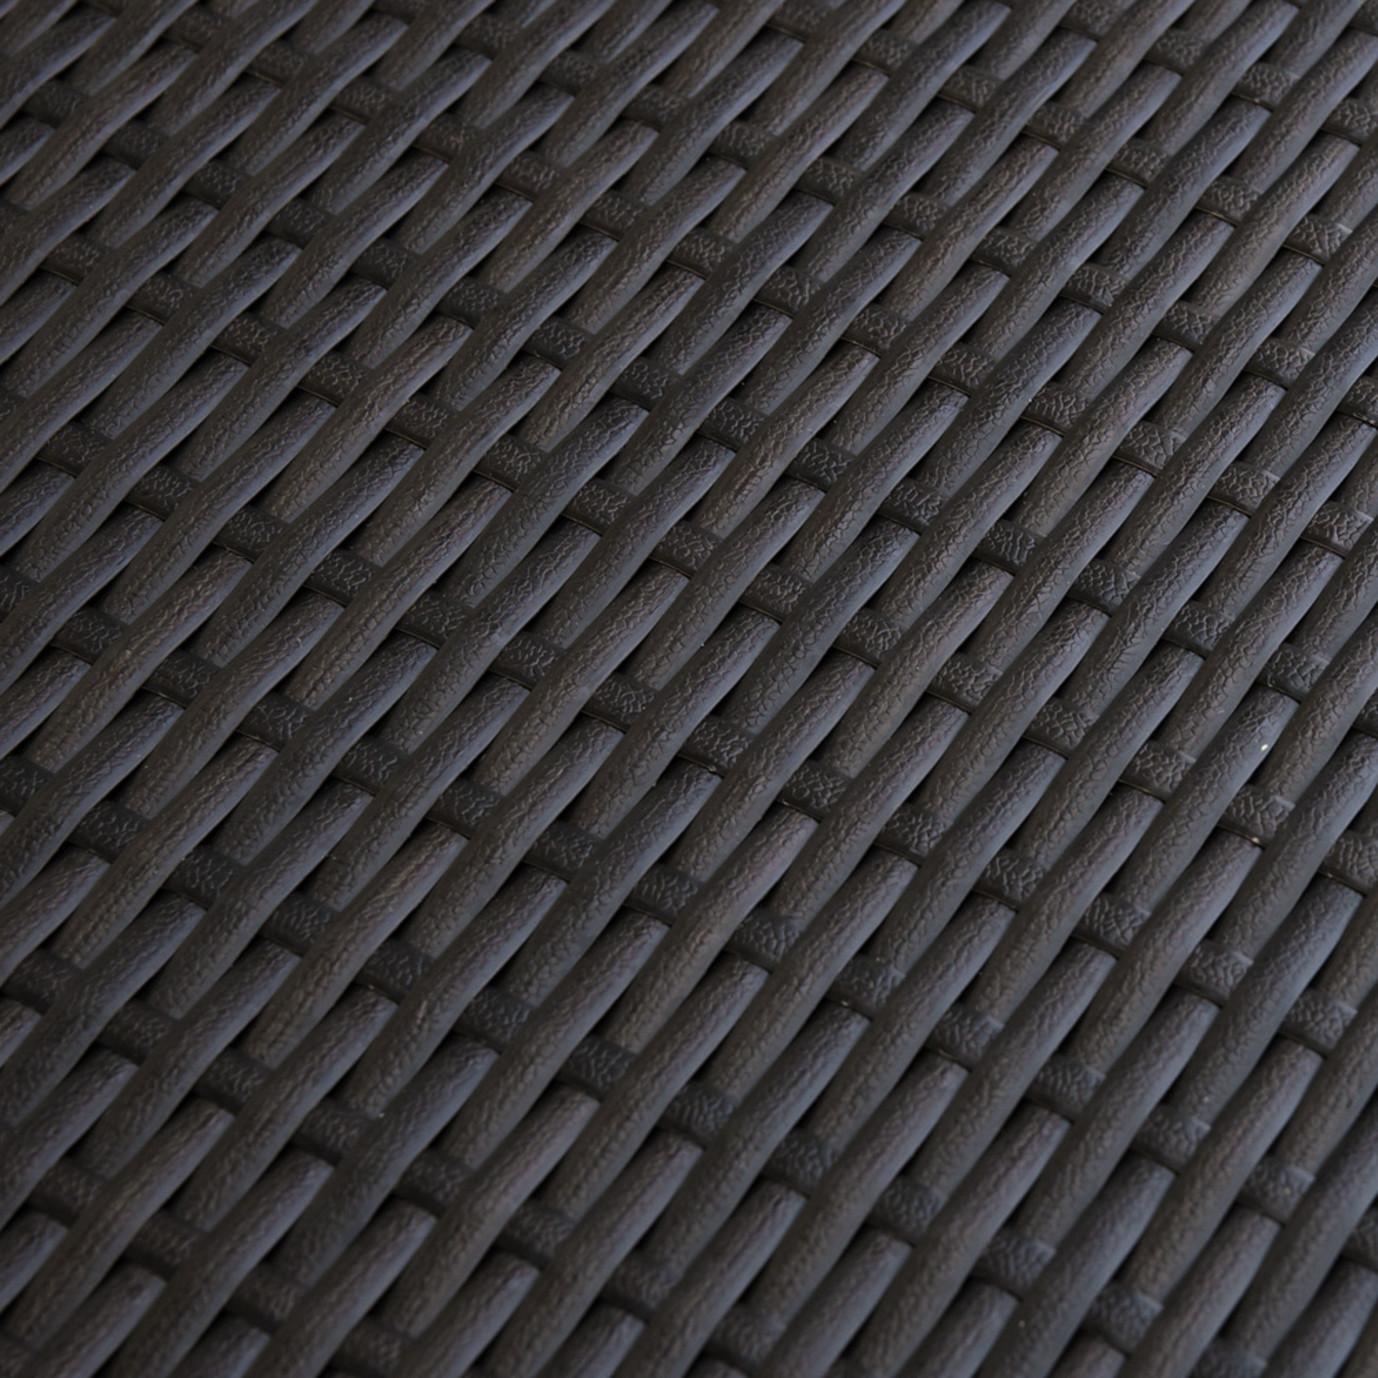 Deco 5pc Motion Club & Ottoman Set - Charcoal Gray